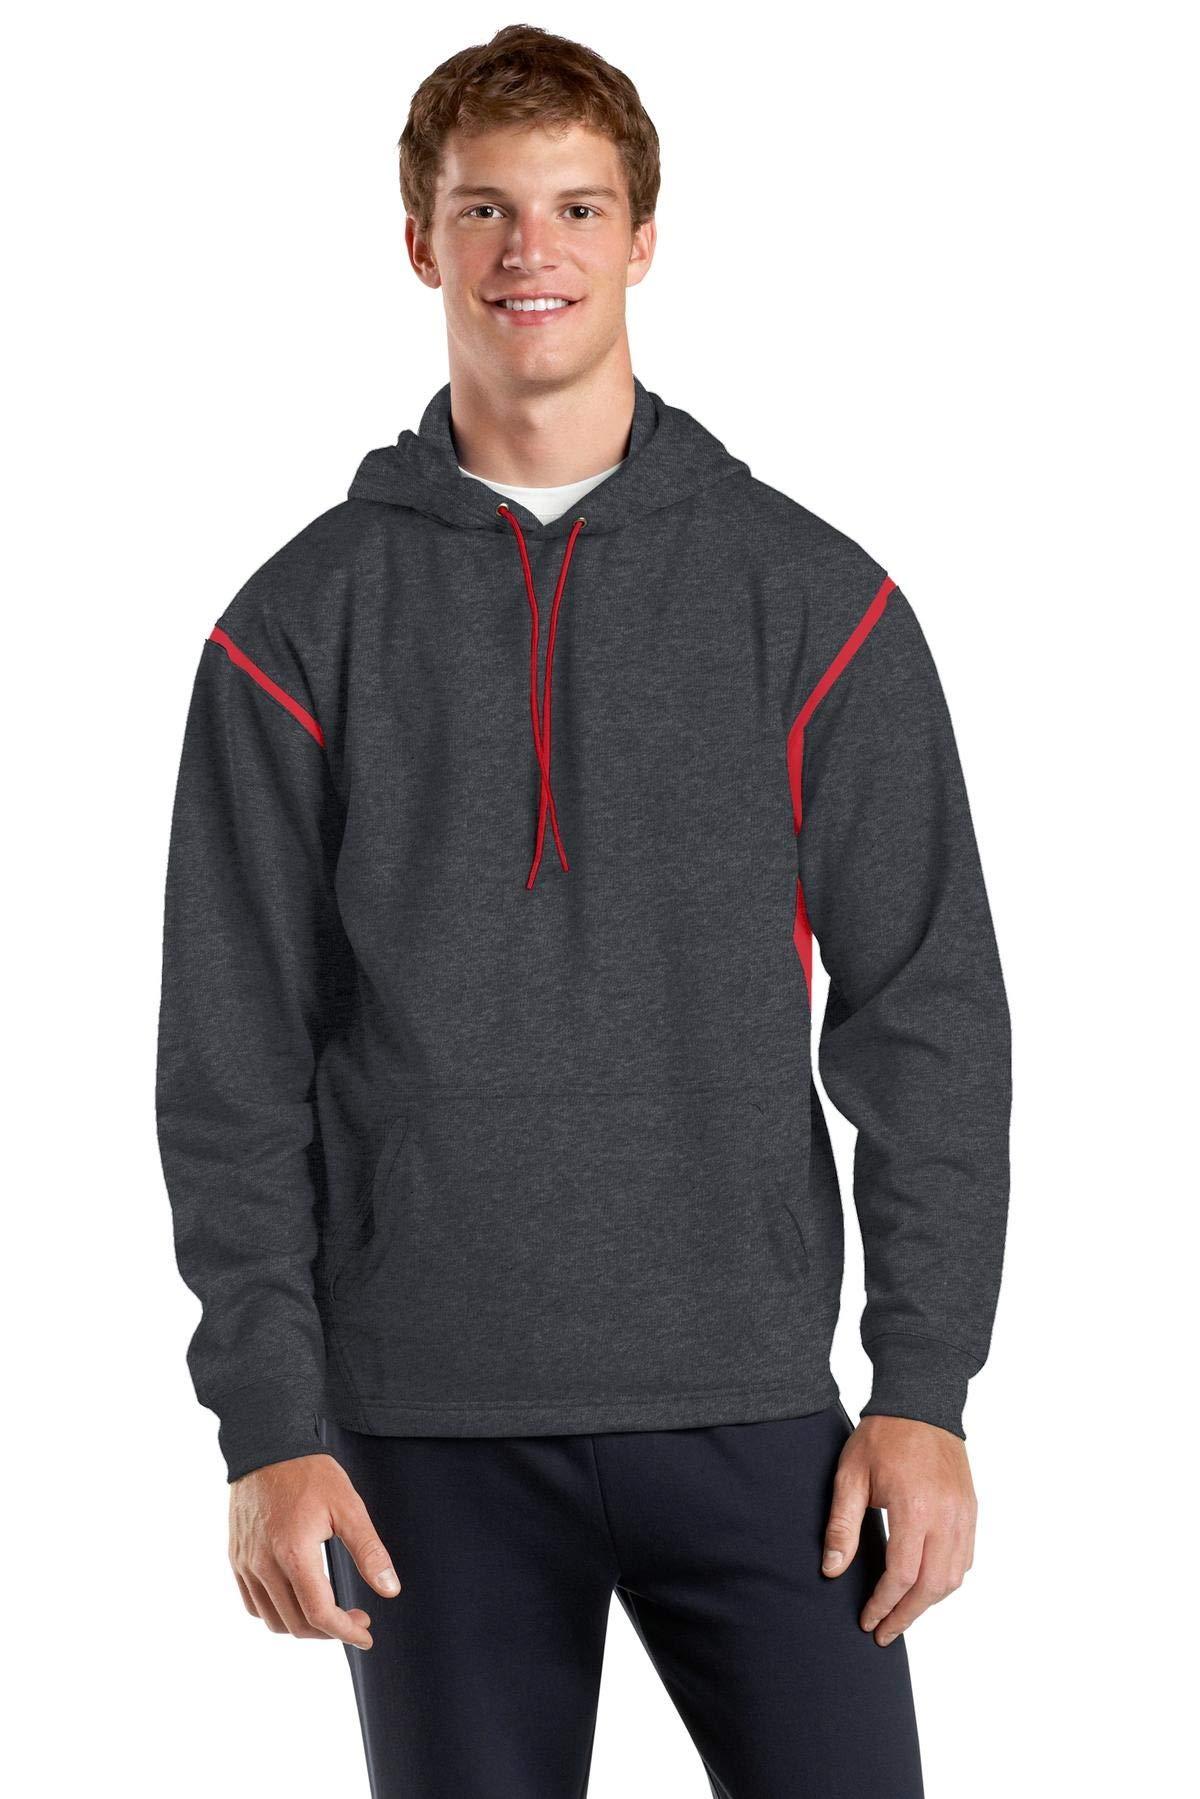 Sport-Tek Men's Tall Tech Fleece Colorblock XLT Graphite Heather/True Red by Sport-Tek